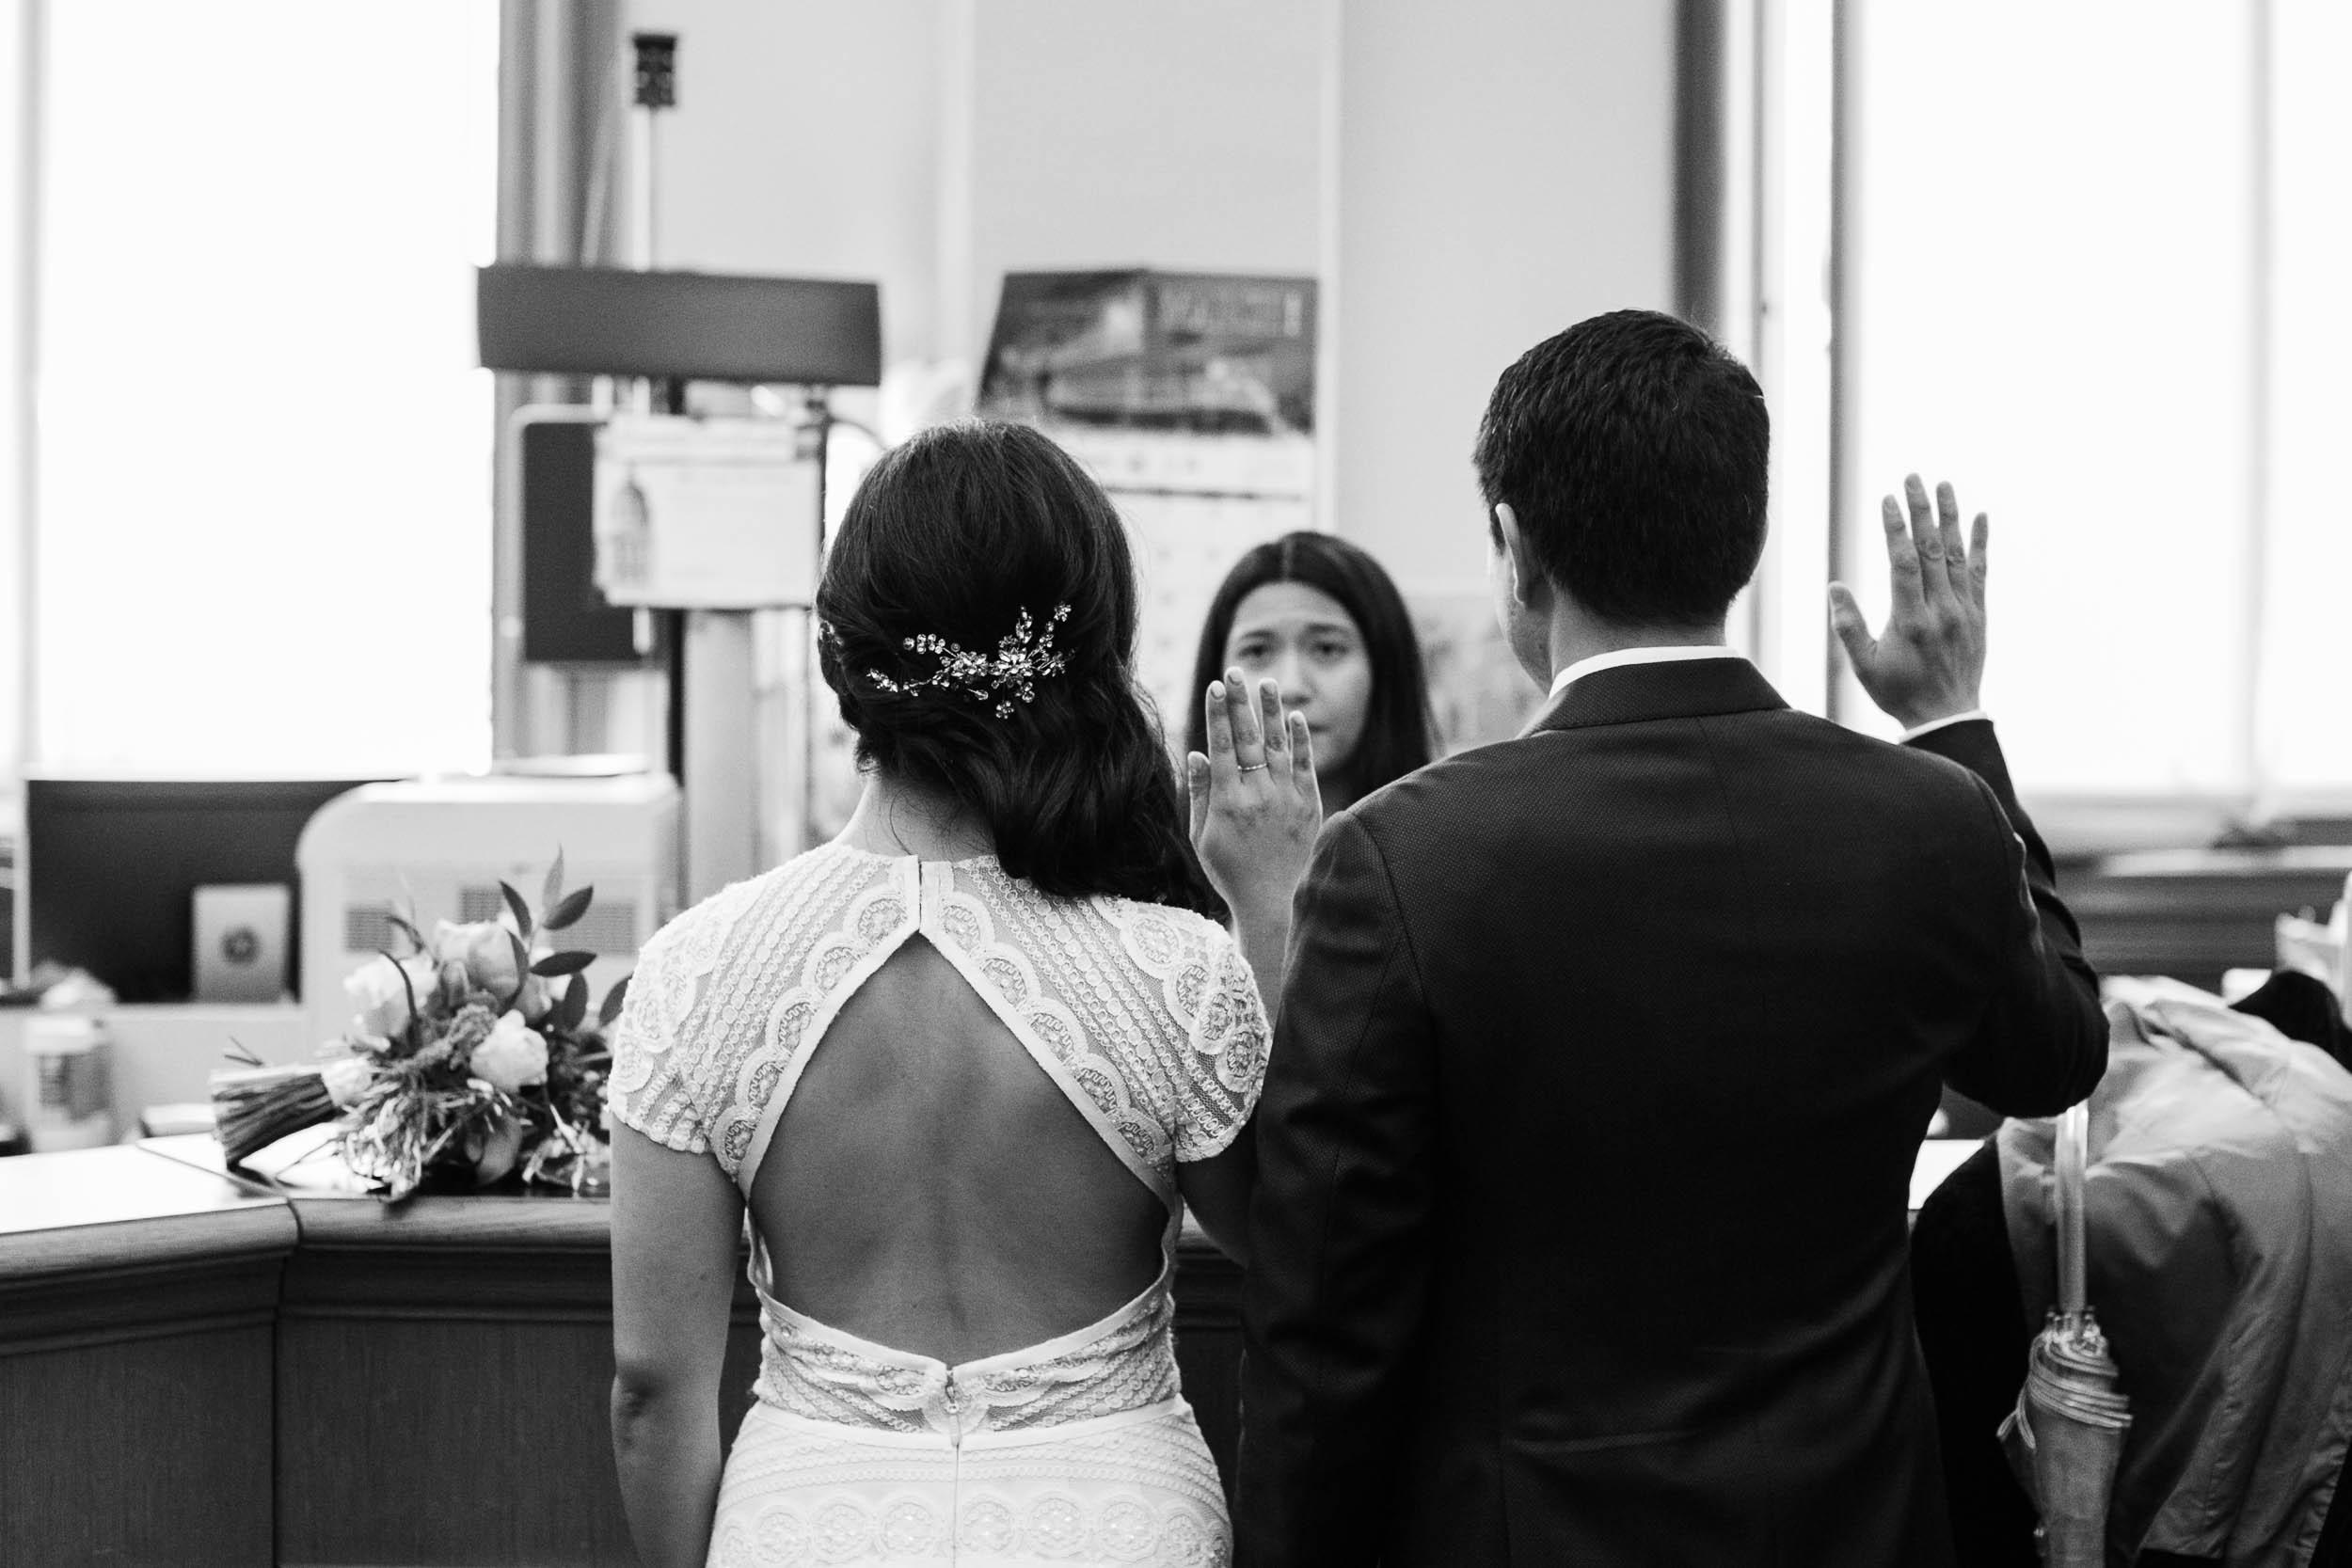 032118_M+D City Hall Wedding_Buena Lane Photography_0299-2.jpg